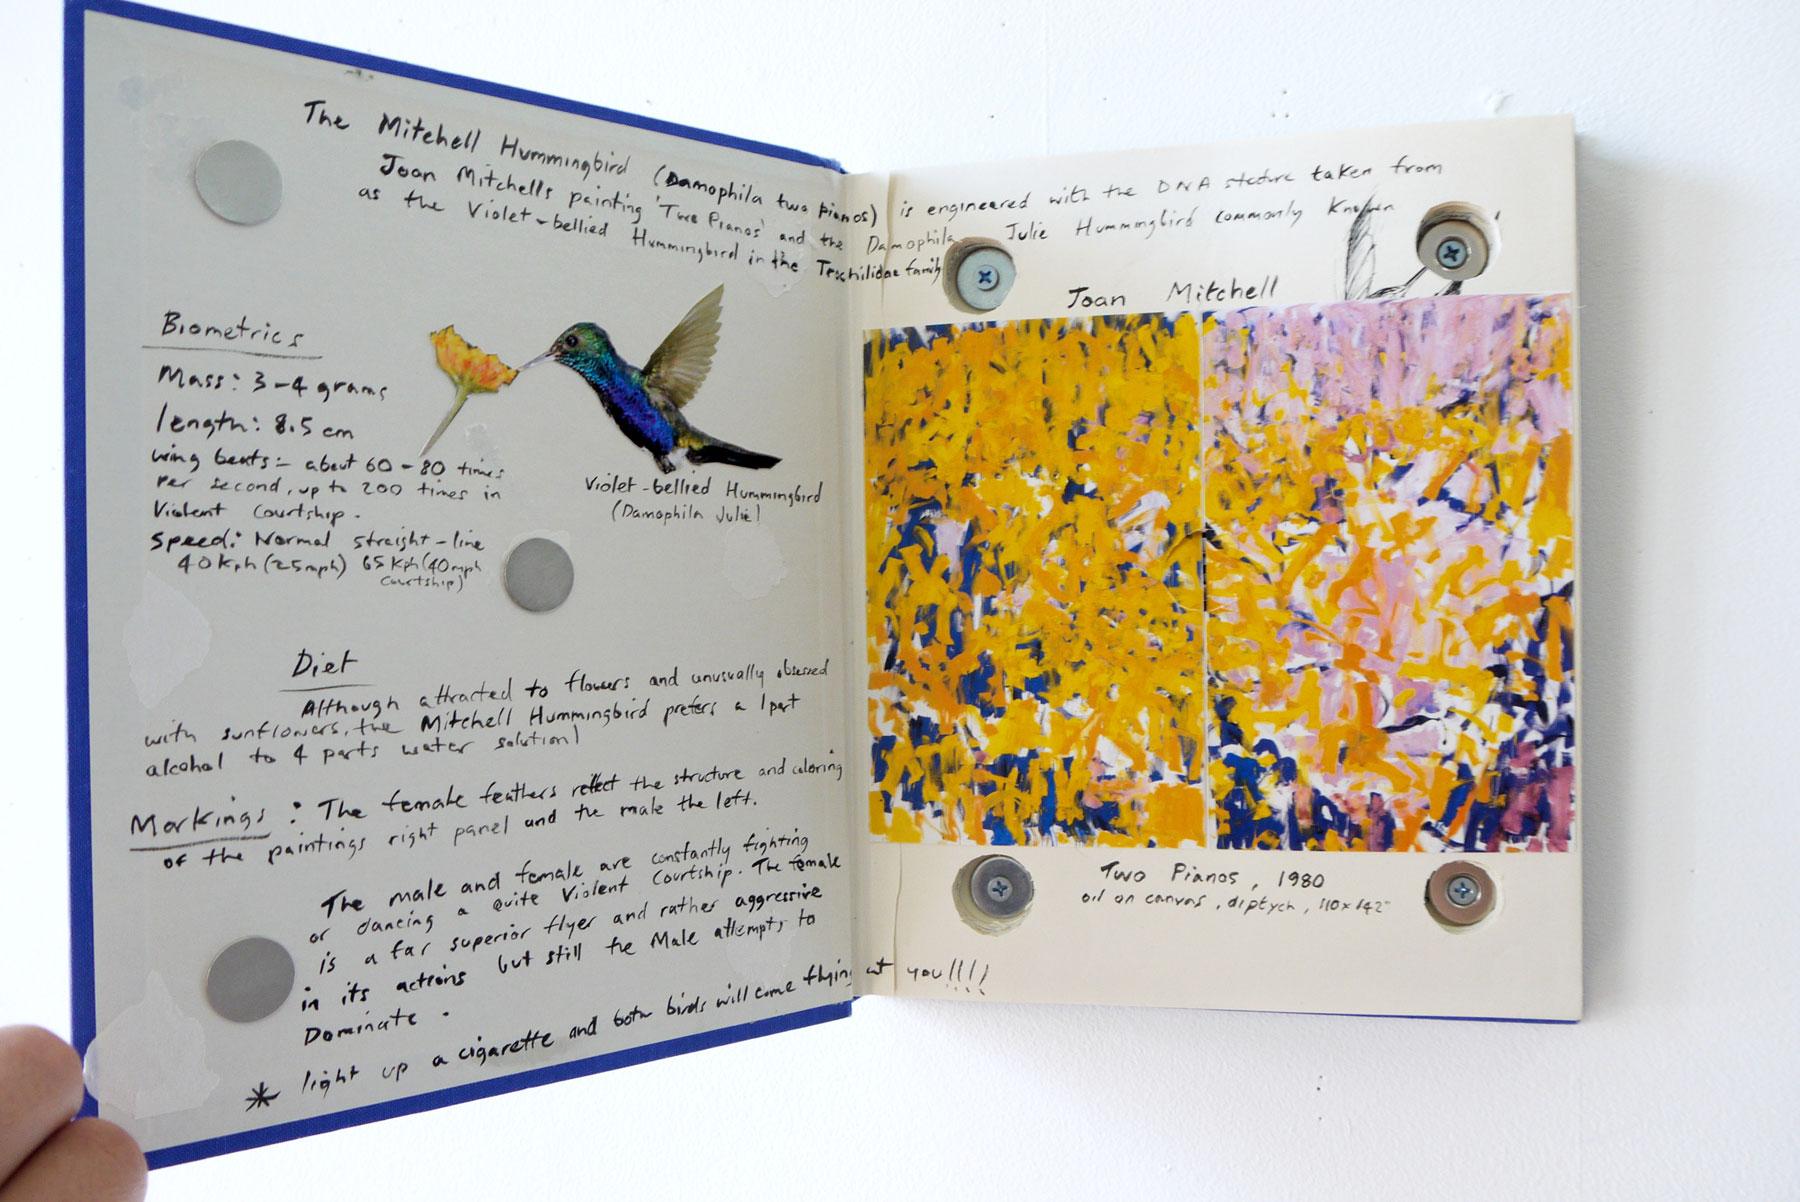 CLIVE SMITH STUDIO : Artwork : Speculative Birds of America and Europe